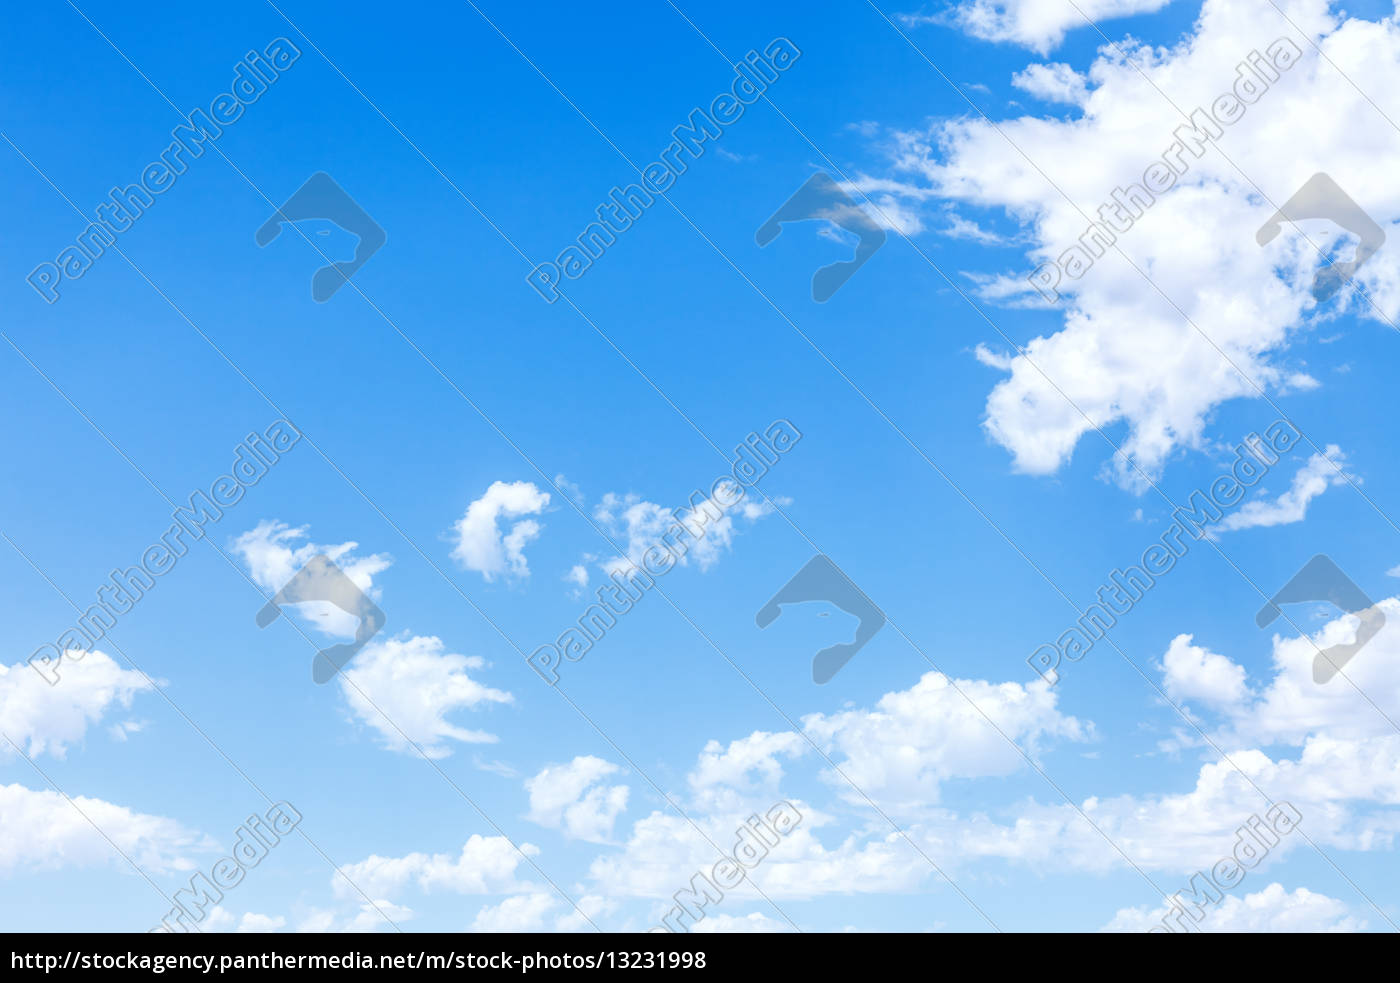 blue, sky - 13231998